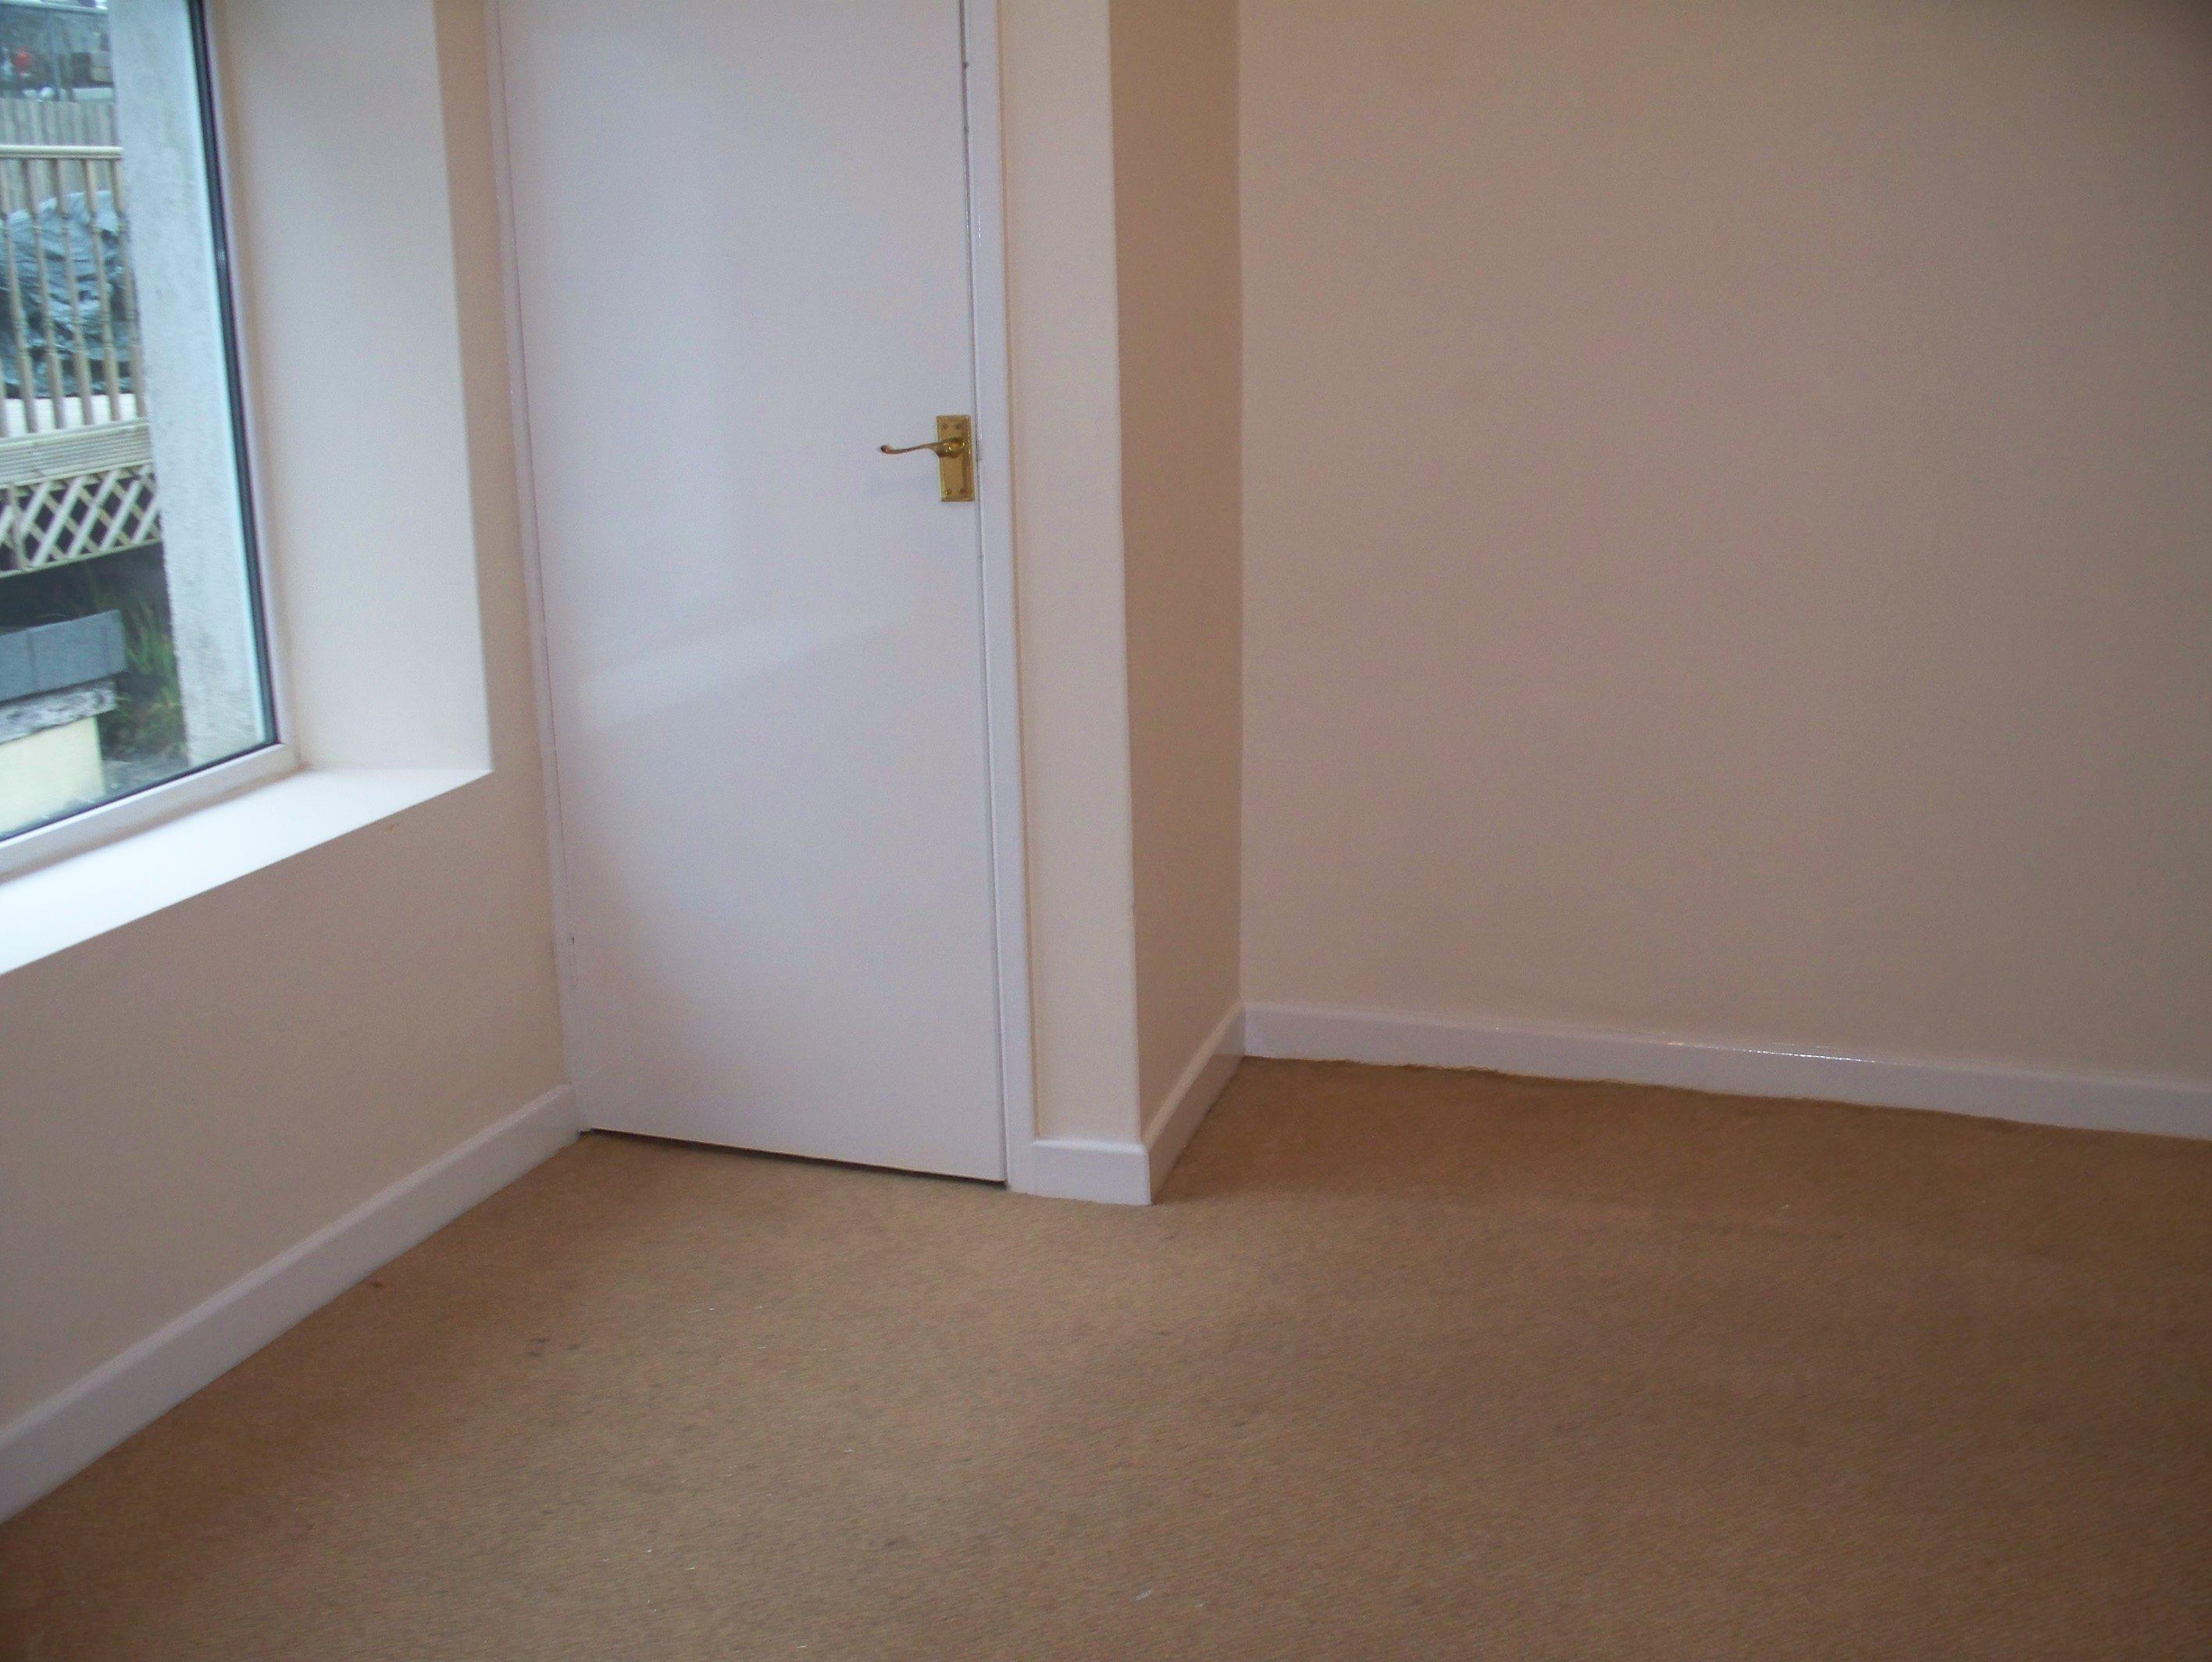 Wisemove. Property for sale. King Edward Street, Blaengarw. Bedroom 3